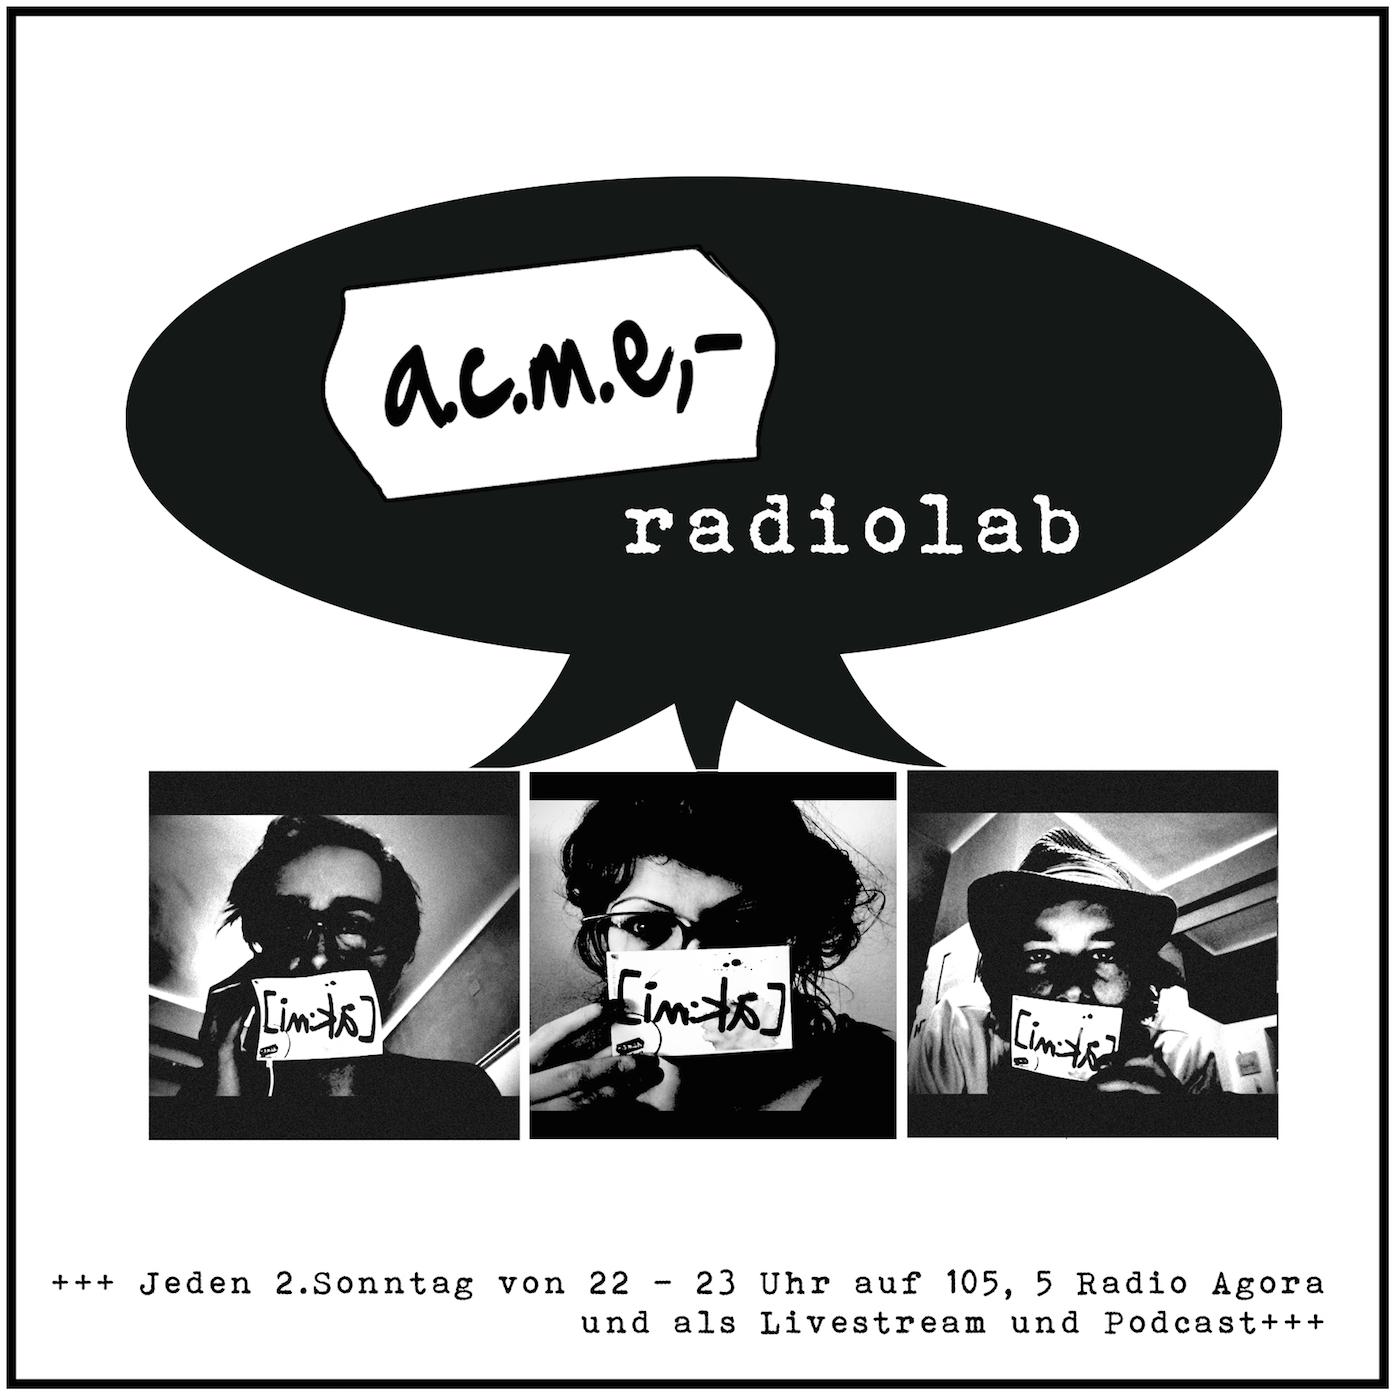 a.c.m.e,- radiolab